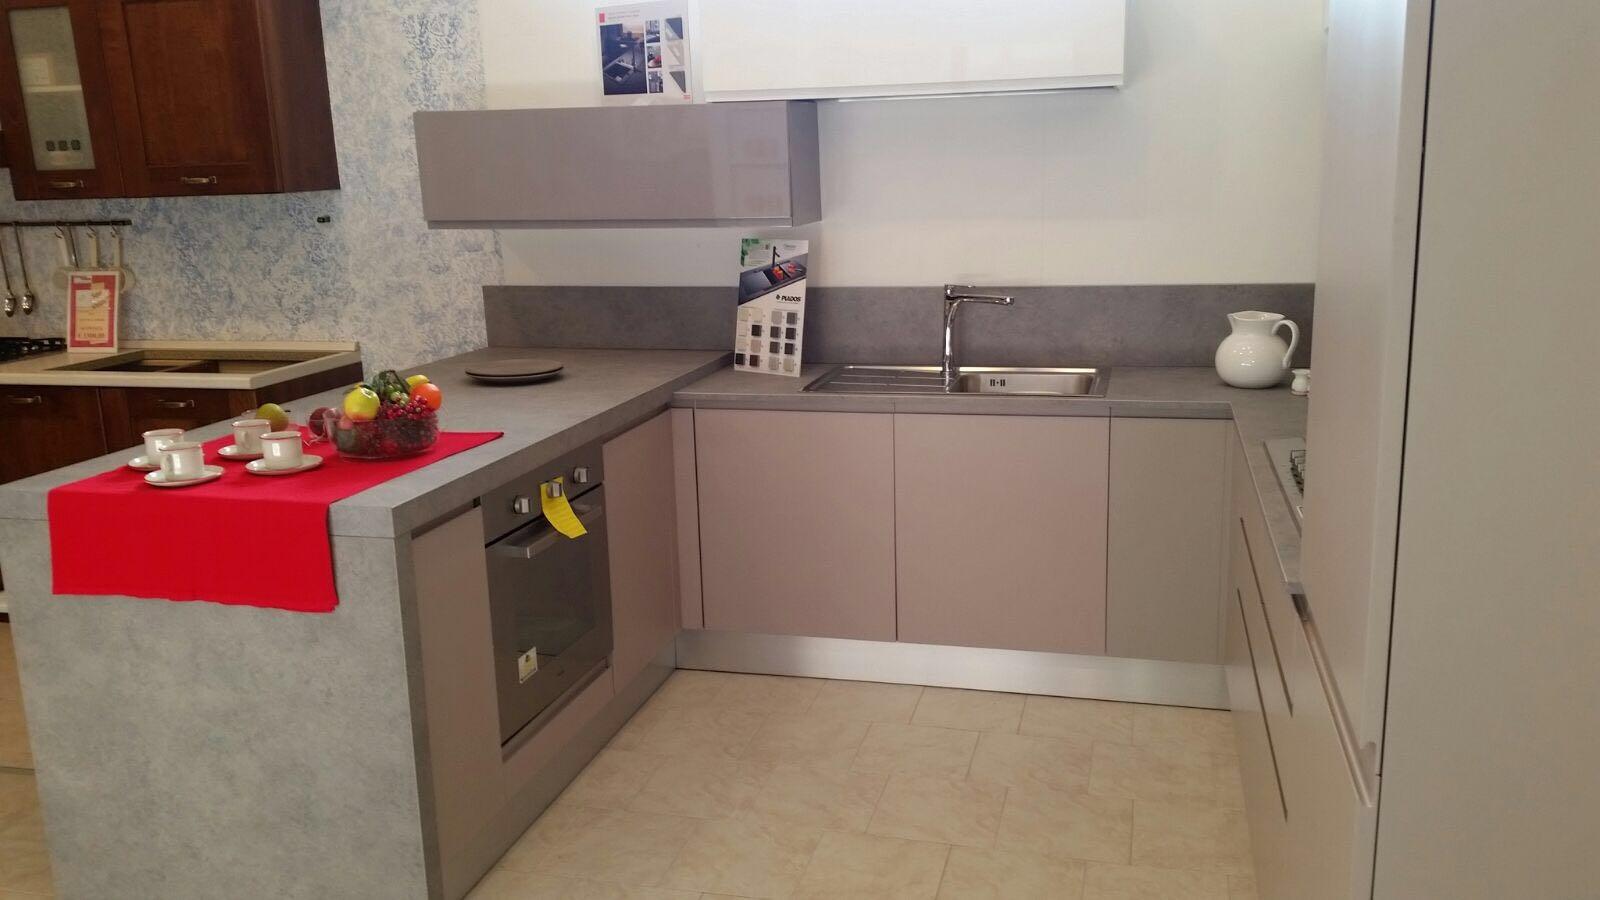 Lampadario bianco e tortora design casa creativa e - Cucina bianca e tortora ...